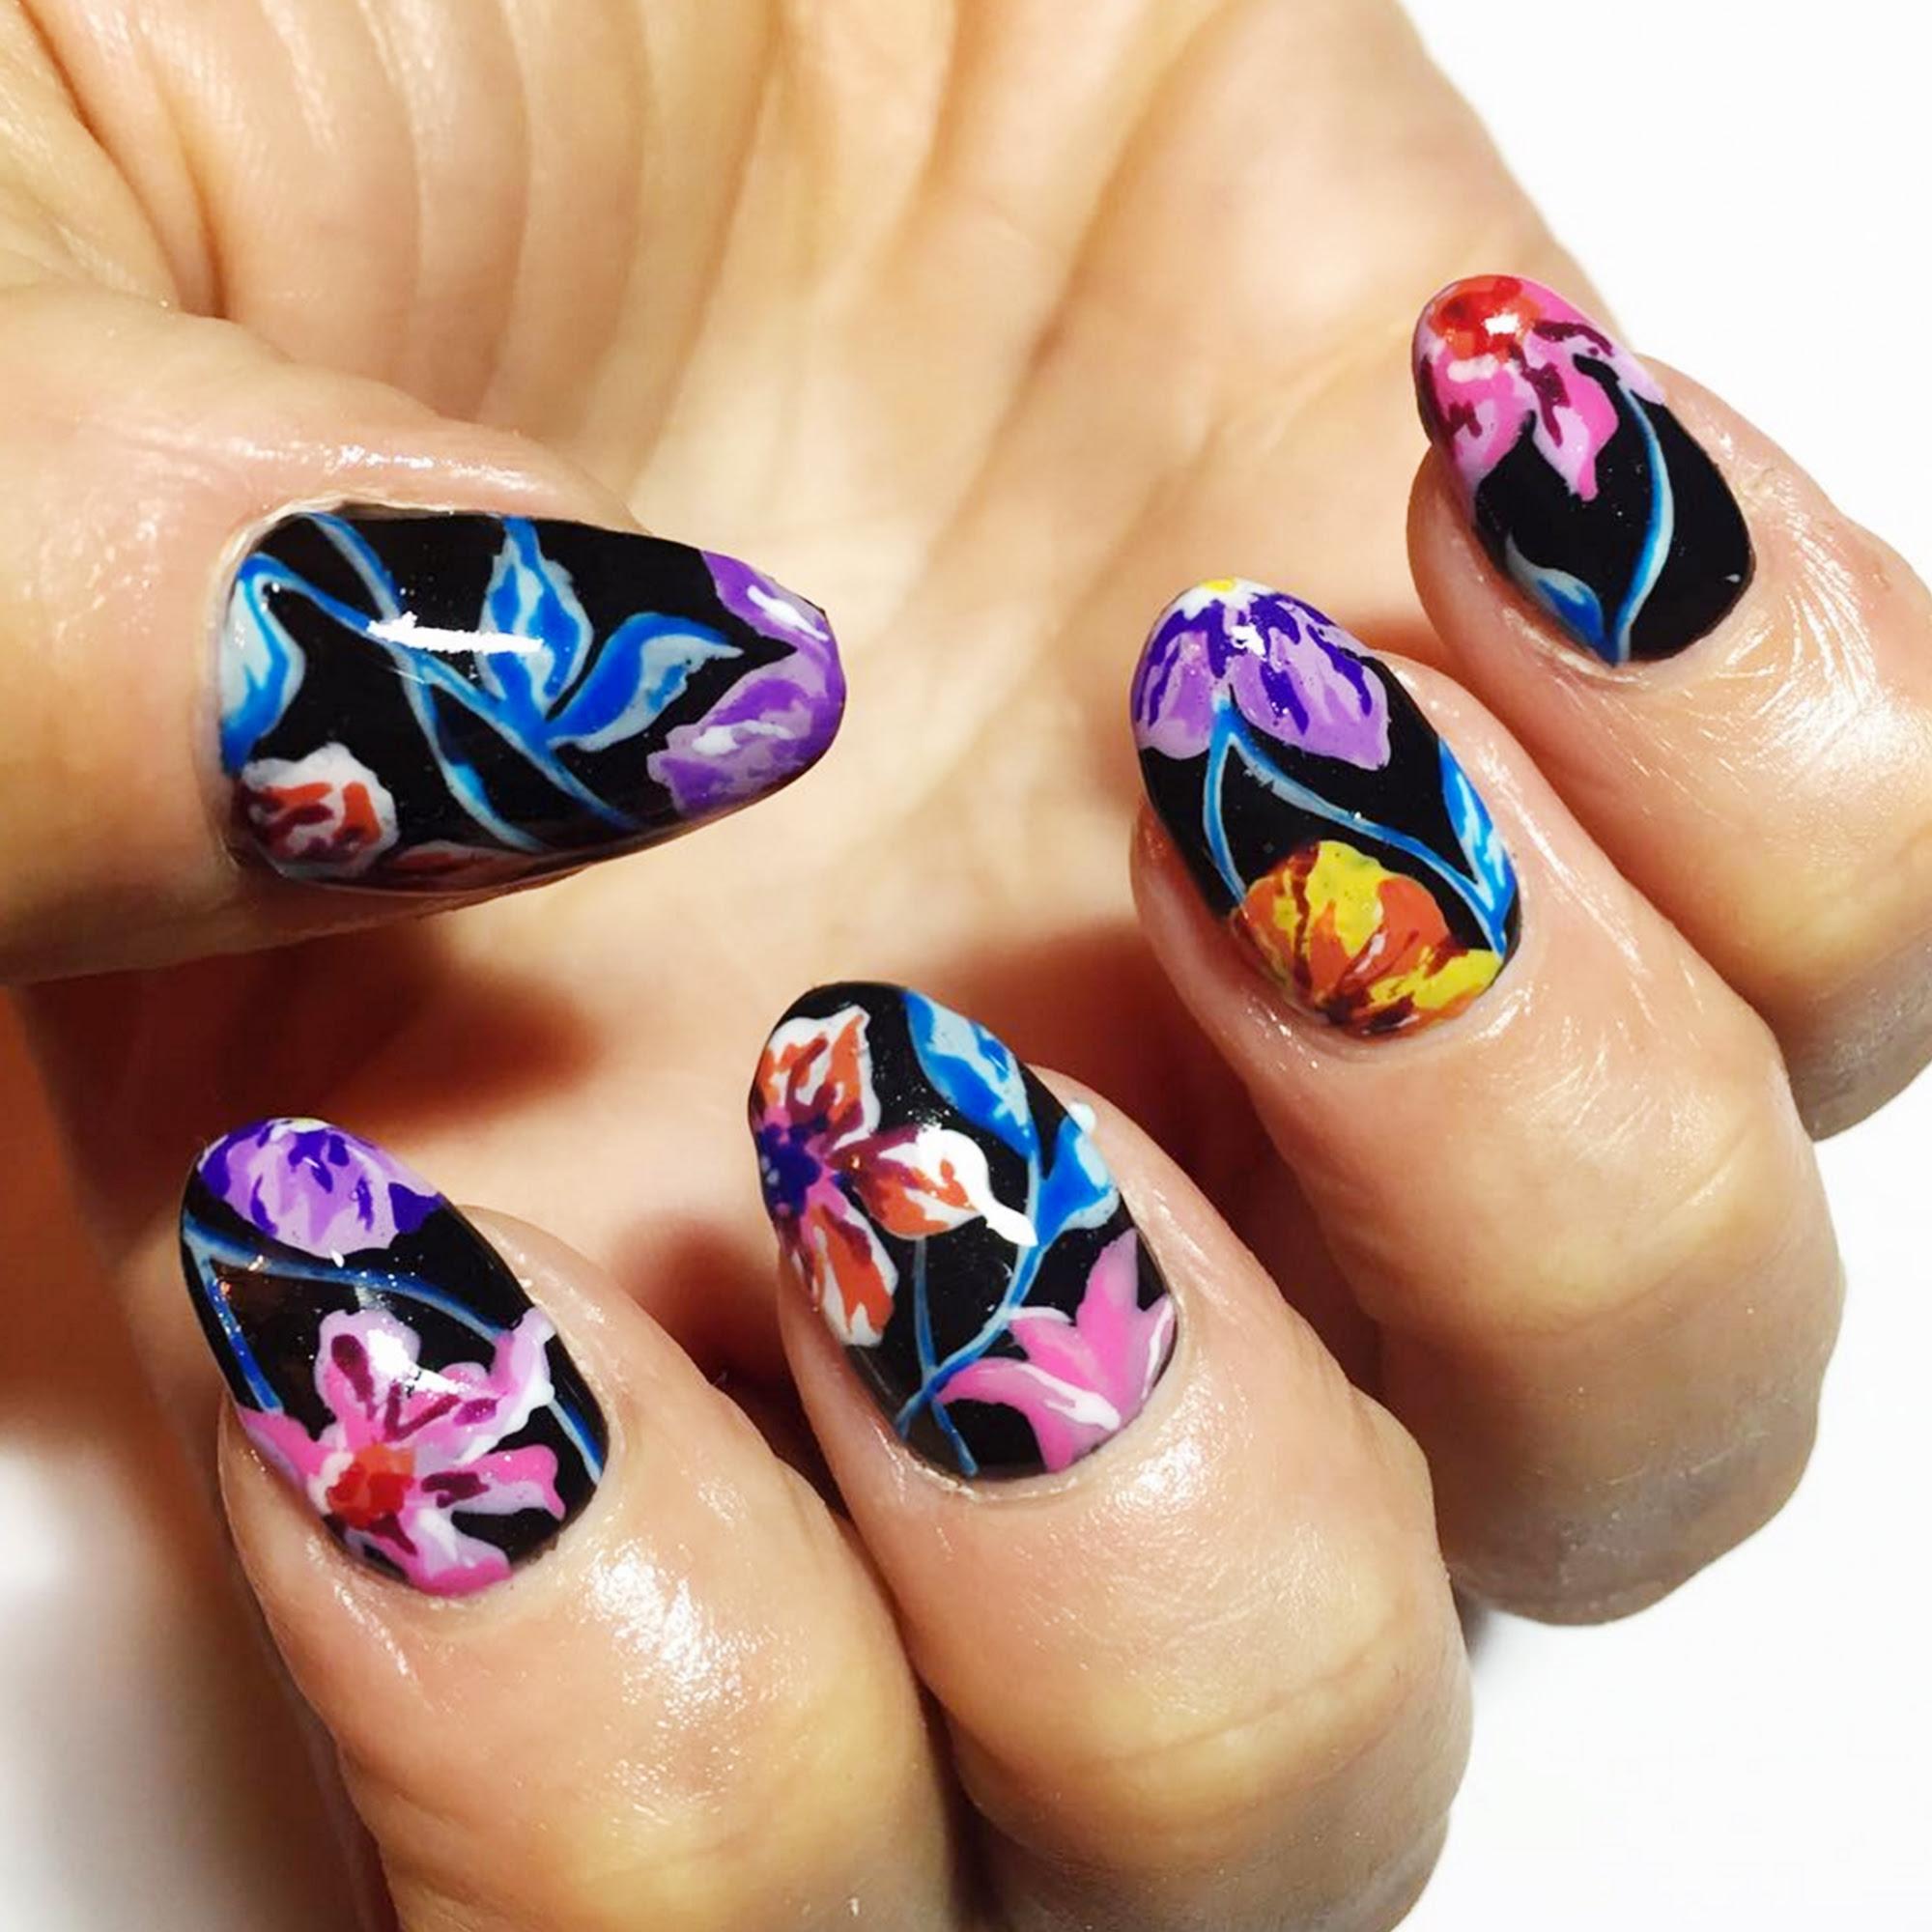 12 Cool Summer Nail Art Designs - Easy Summer Manicure Ideas